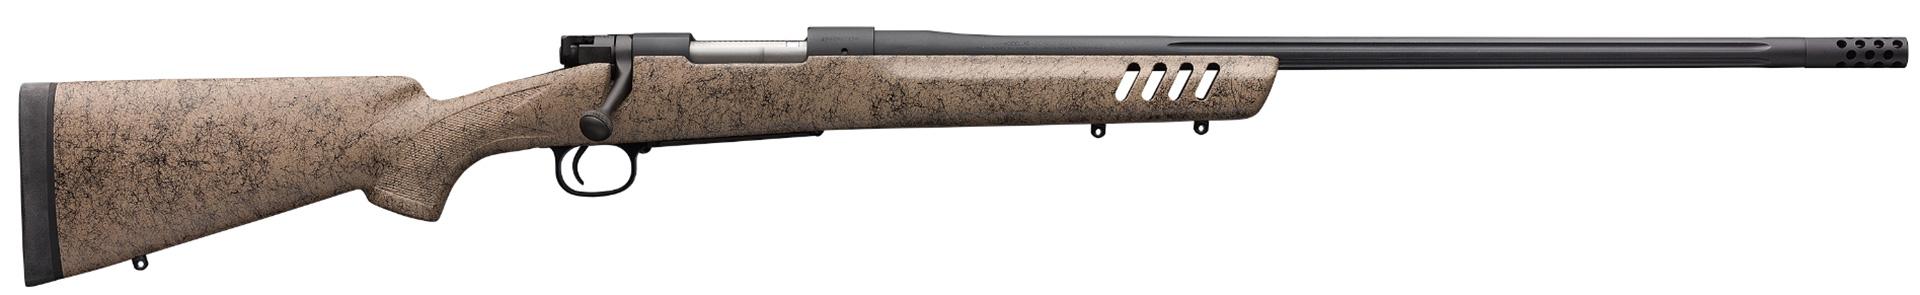 winchester model 70 long range mb caccia carabina